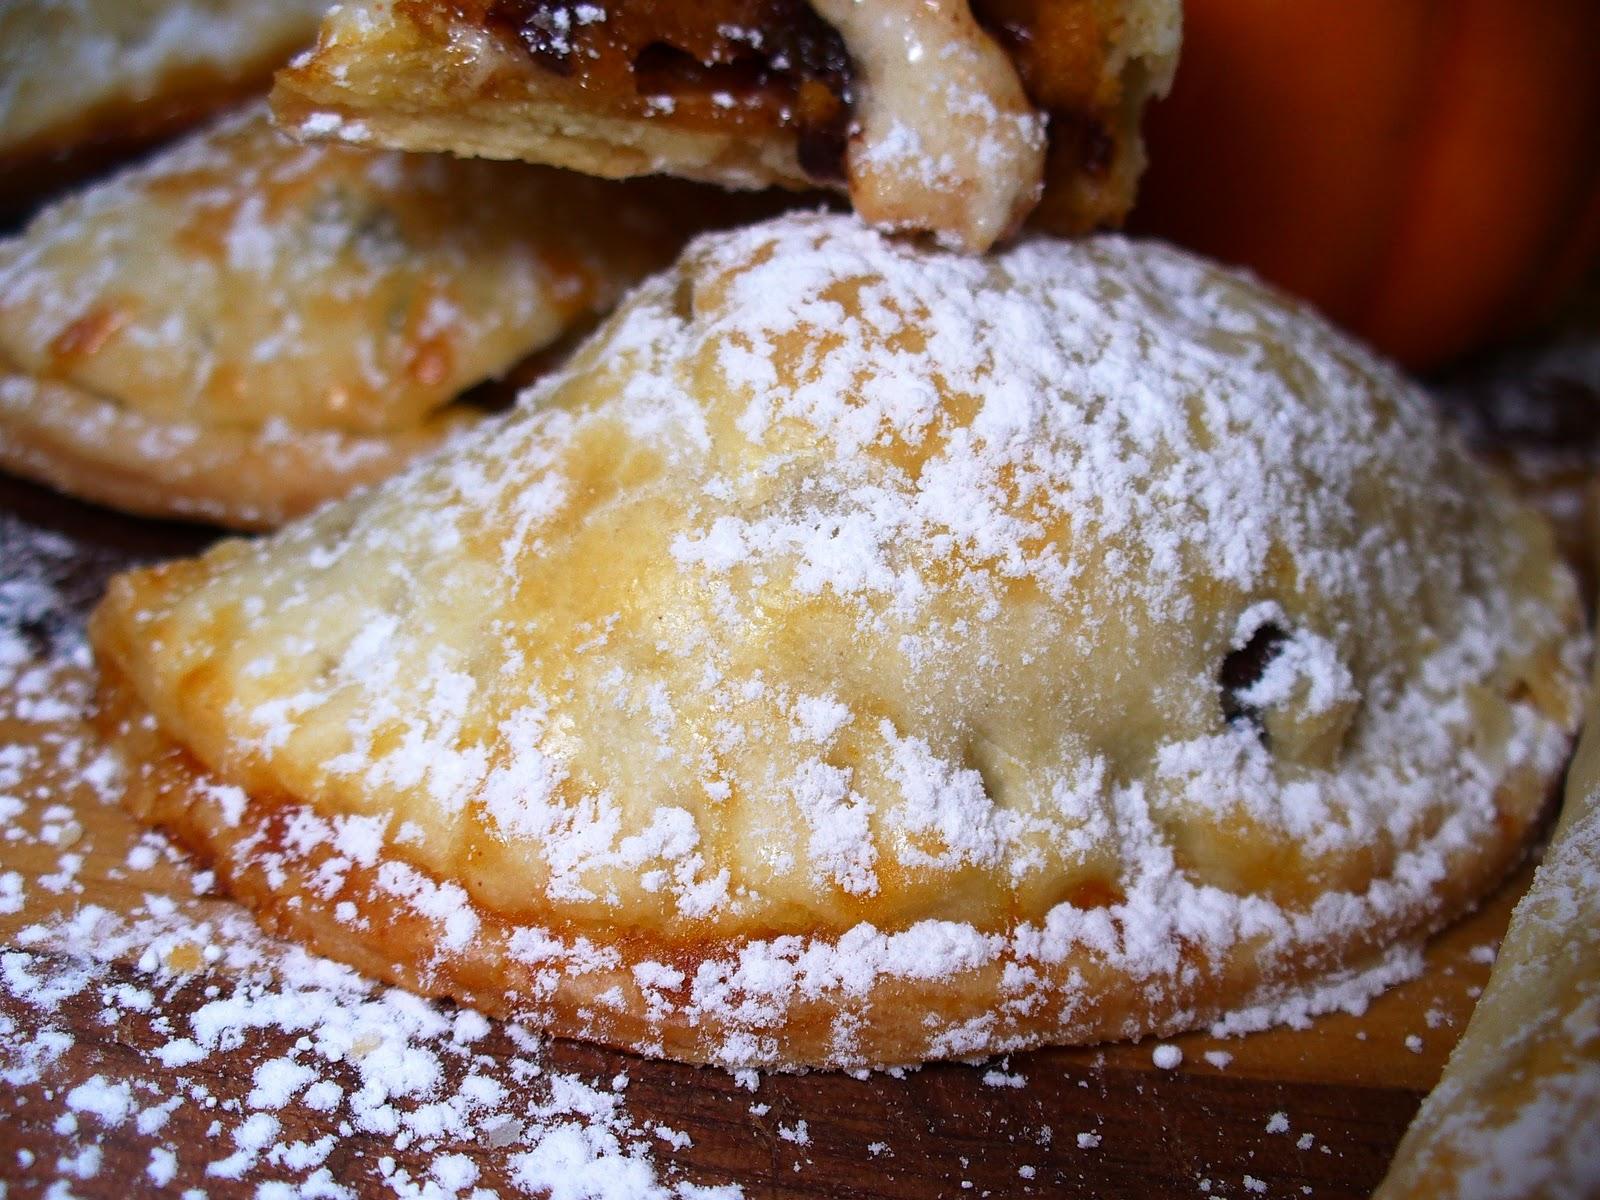 Leenee's Sweetest Delights: Mini Chocolate Chip Pumpkin Pies